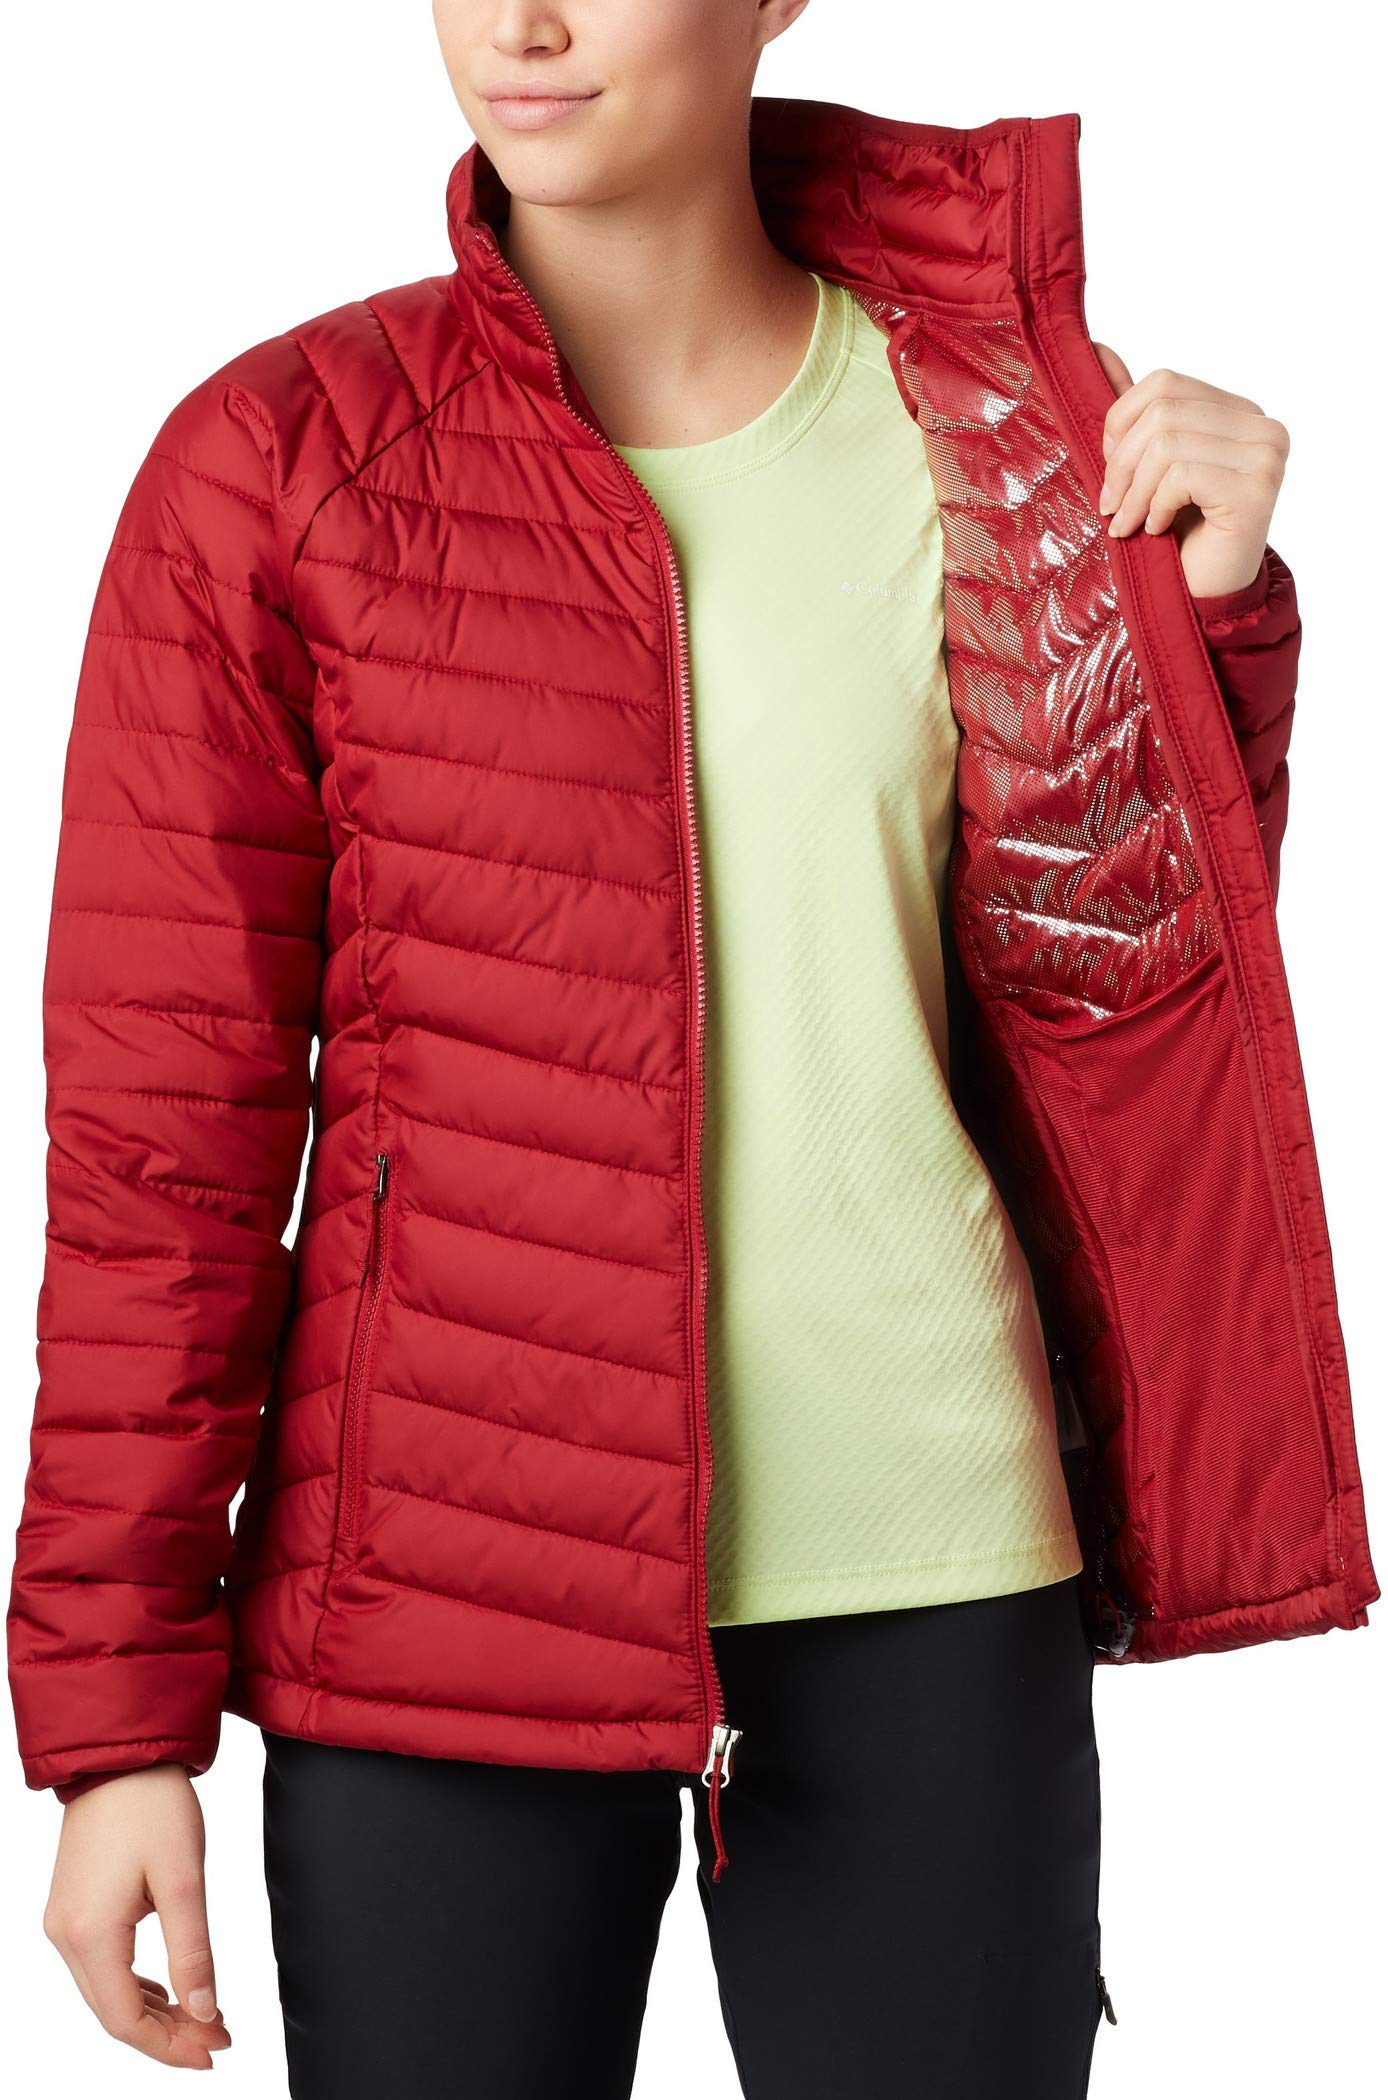 81%2BVRYBzGmL - Columbia Women's Powder Lite Jacket